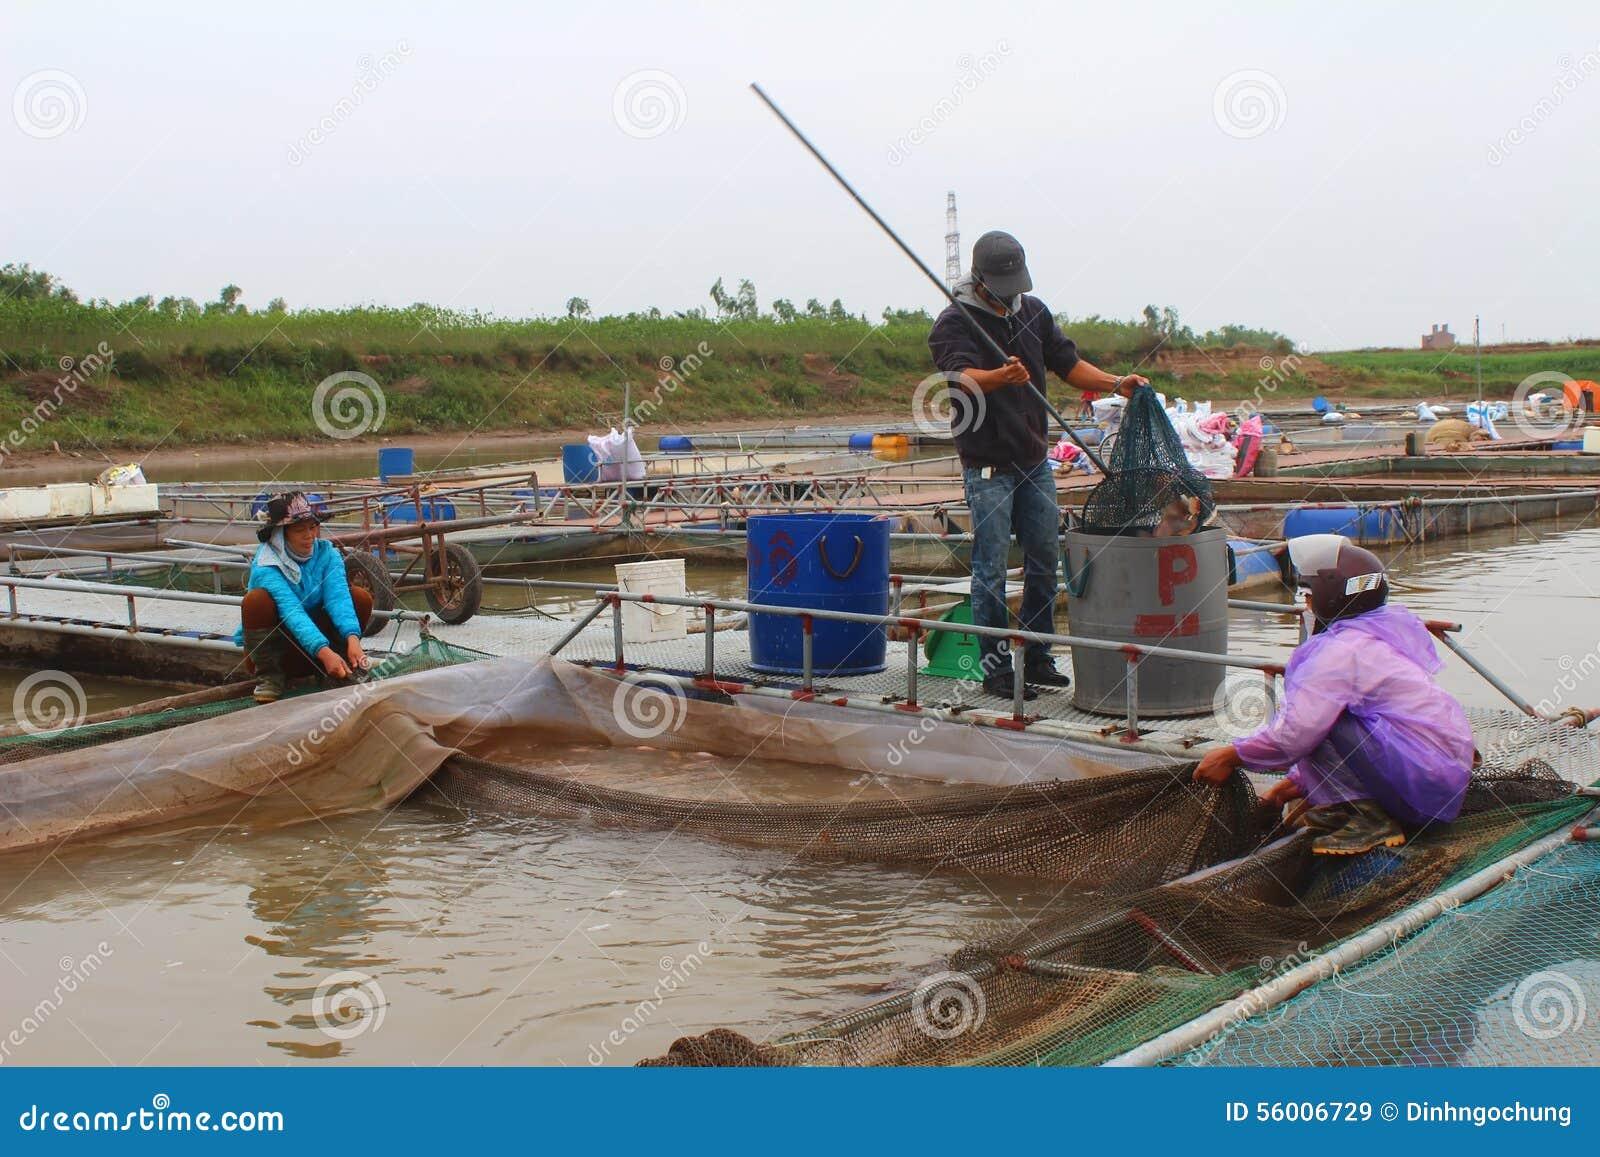 Fishermen and fish farm in river editorial stock image for Fish river tree farm